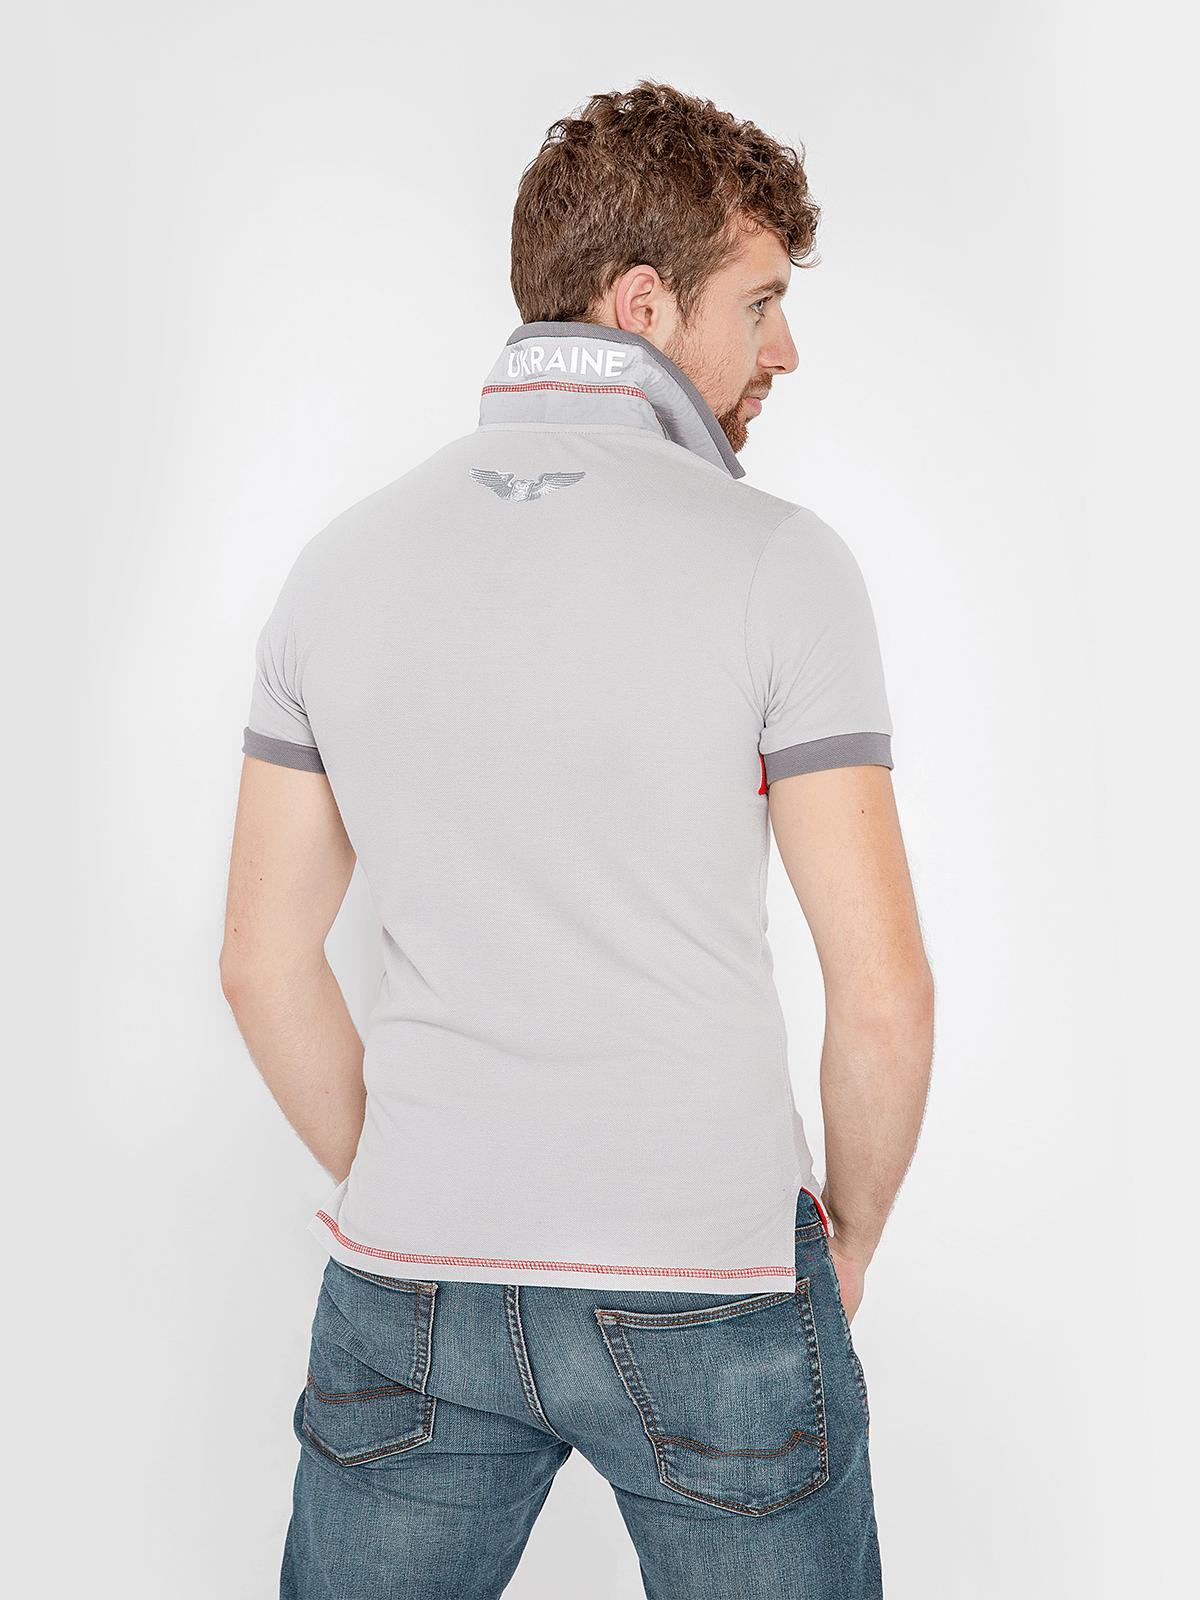 Men's Polo Shirt Wings. Color світло-сірий.  Pique fabric: 100% cotton.